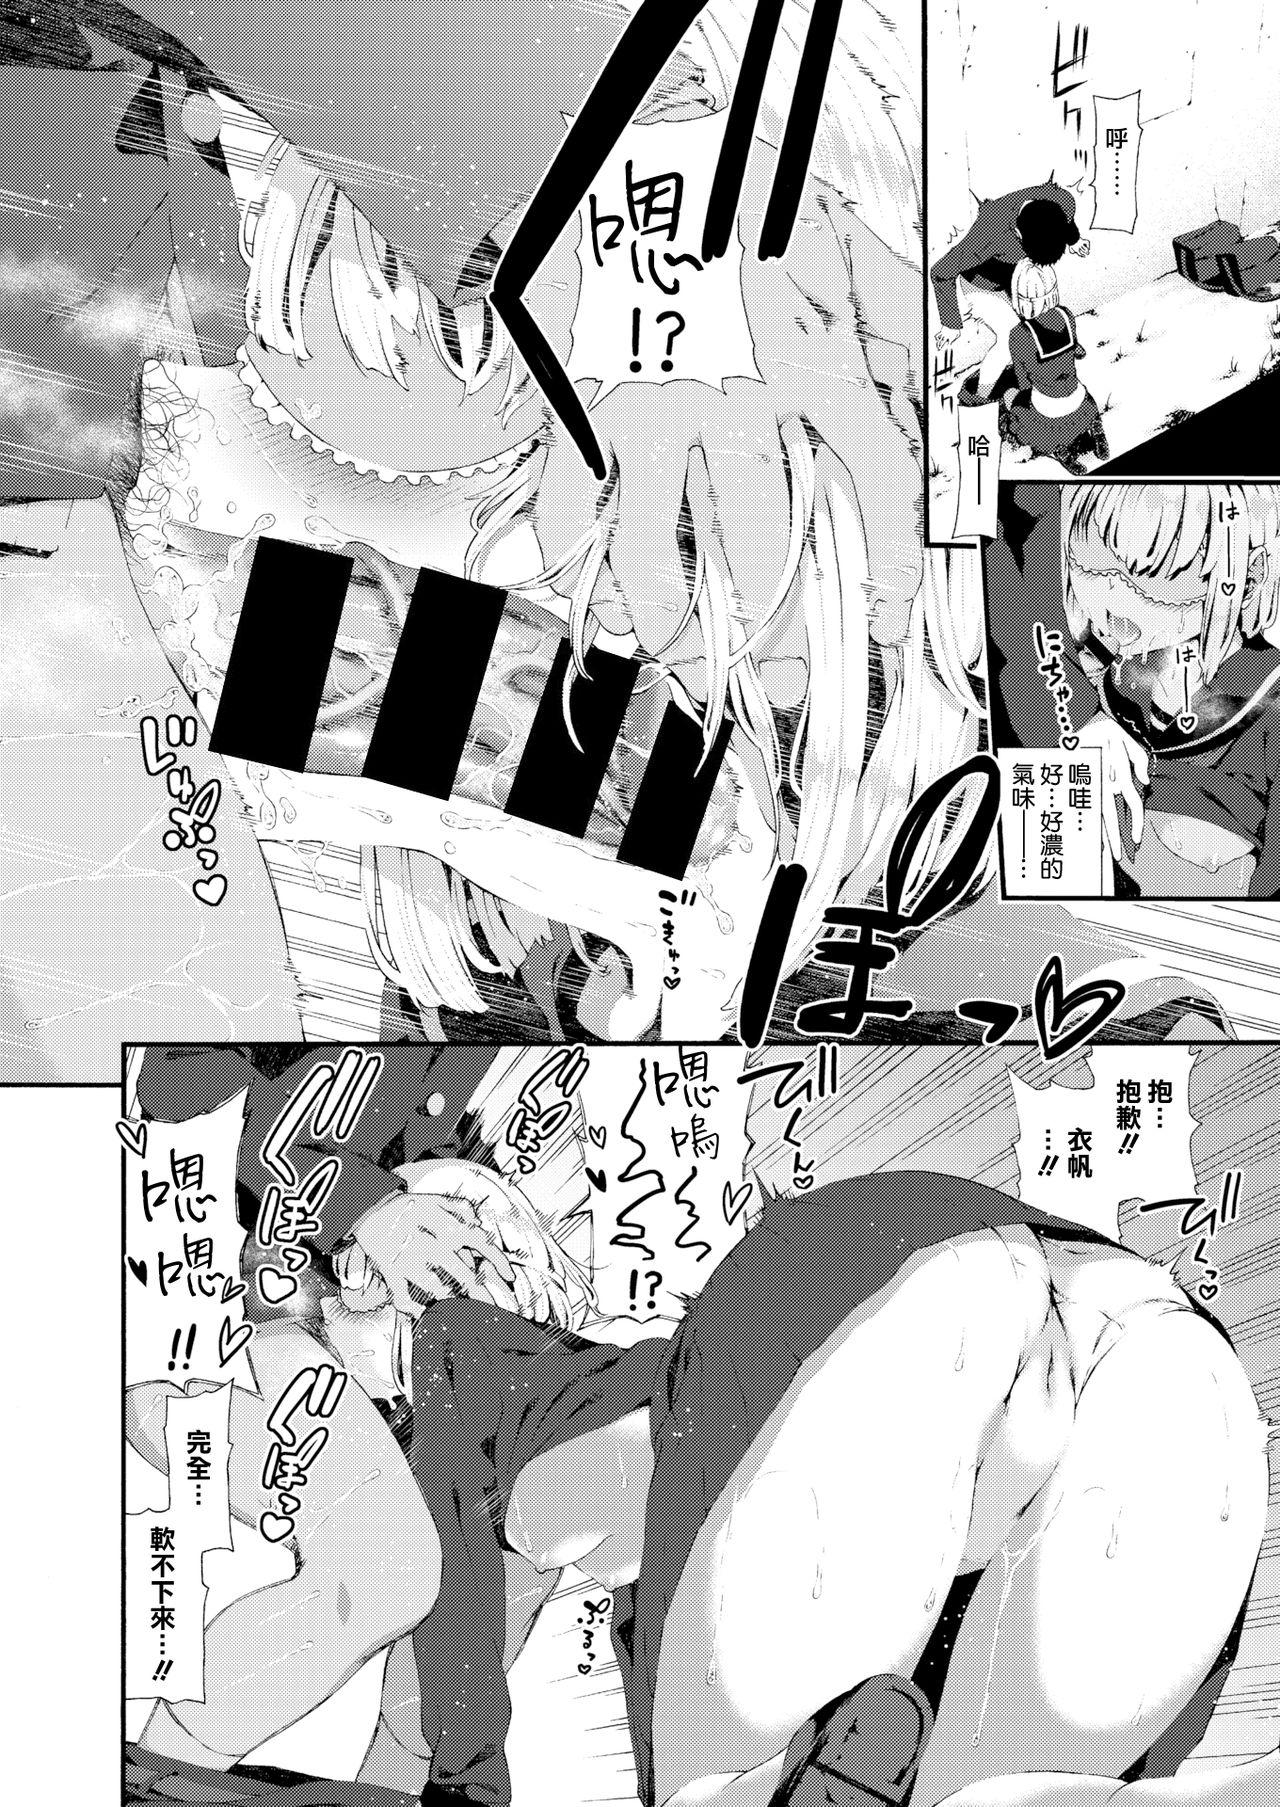 [Izure] Iho-chan no Jijou - Ihochan no situation. (COMIC X-EROS #63) [Chinese] [無邪気漢化組] [Digital] 13